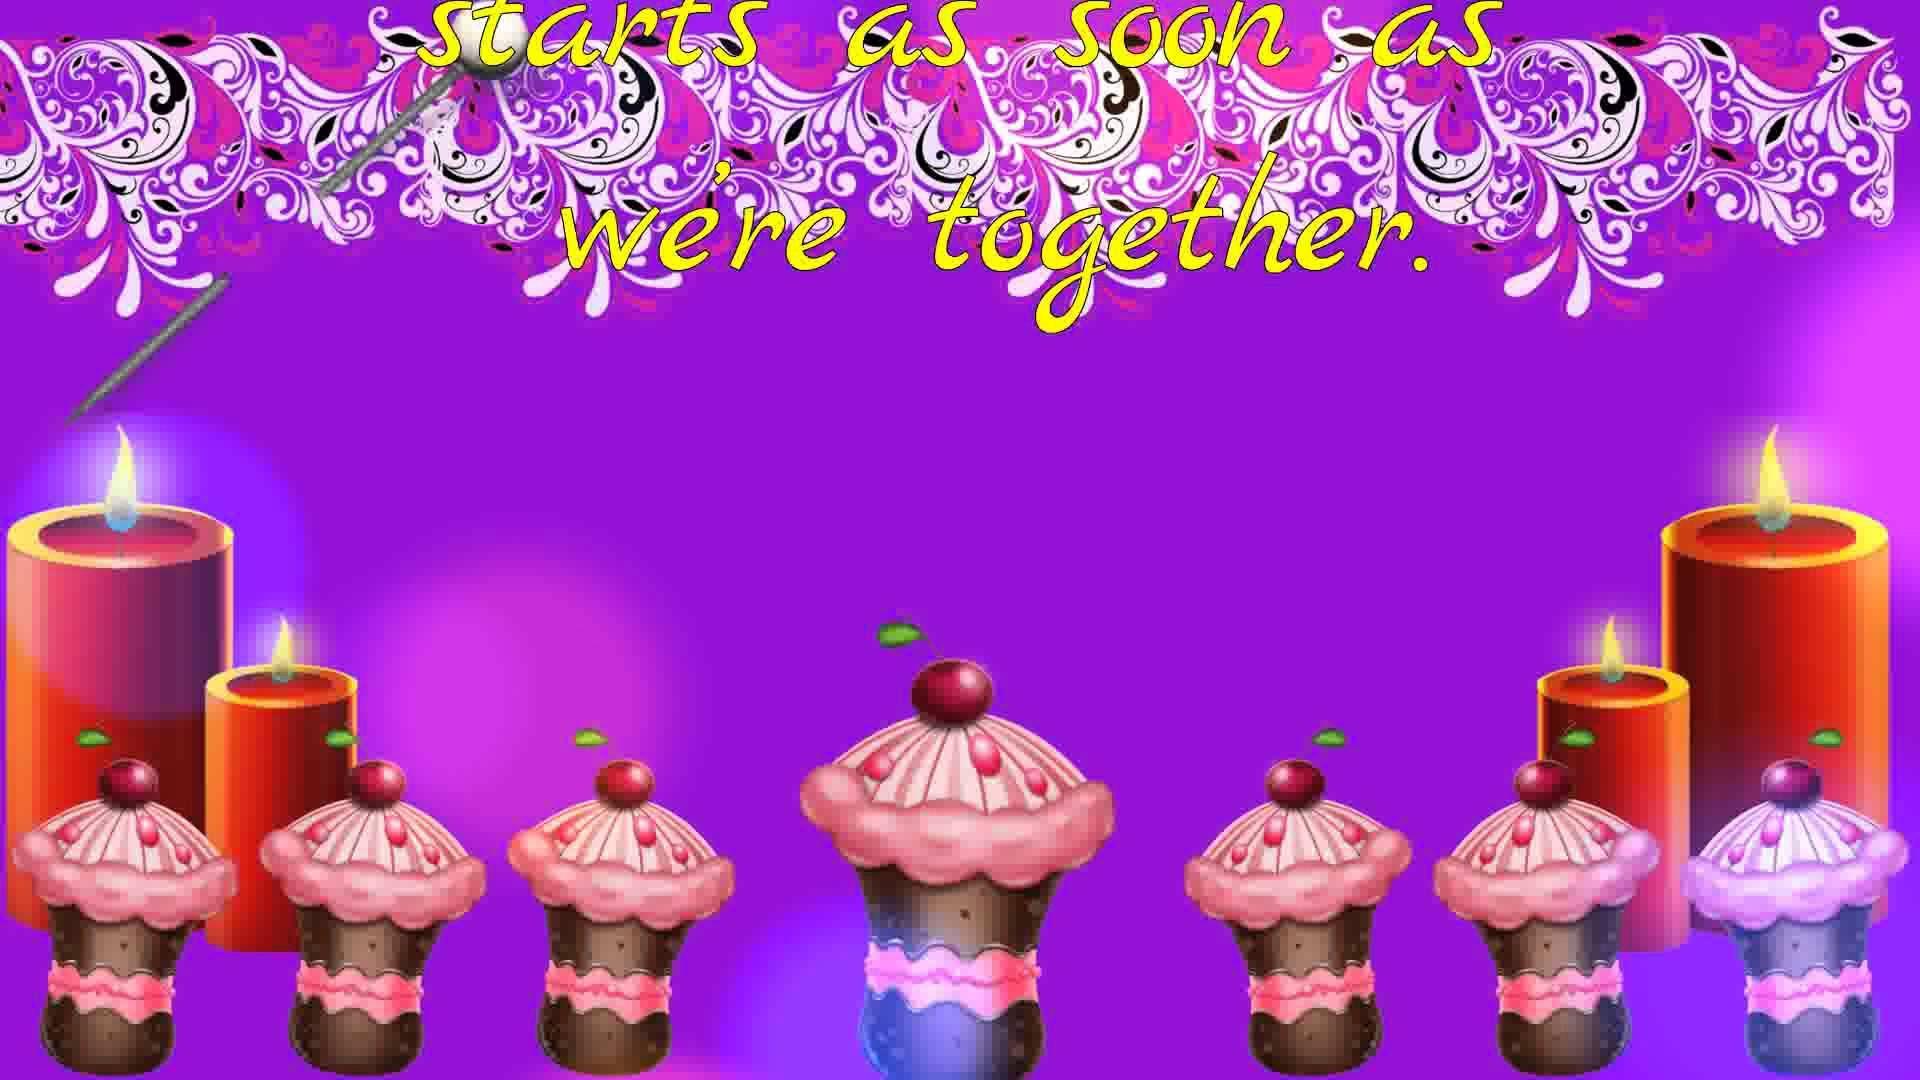 Birthday Greetings Video Animated Greetings To Wish Pinterest